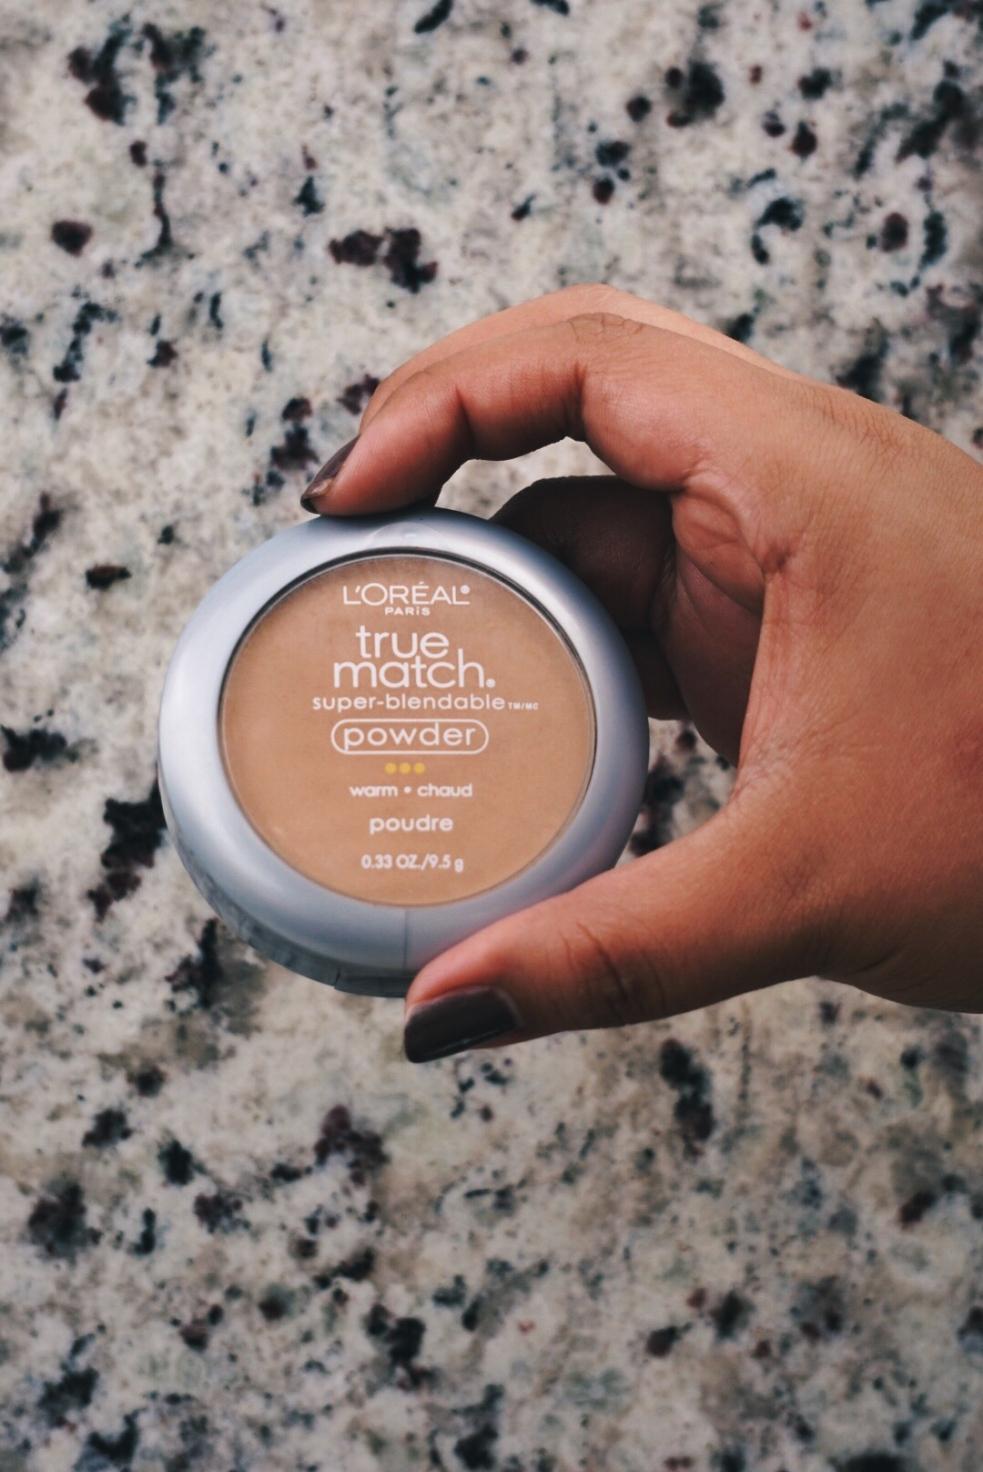 L'Oreal True Match Powder Makeup Routine